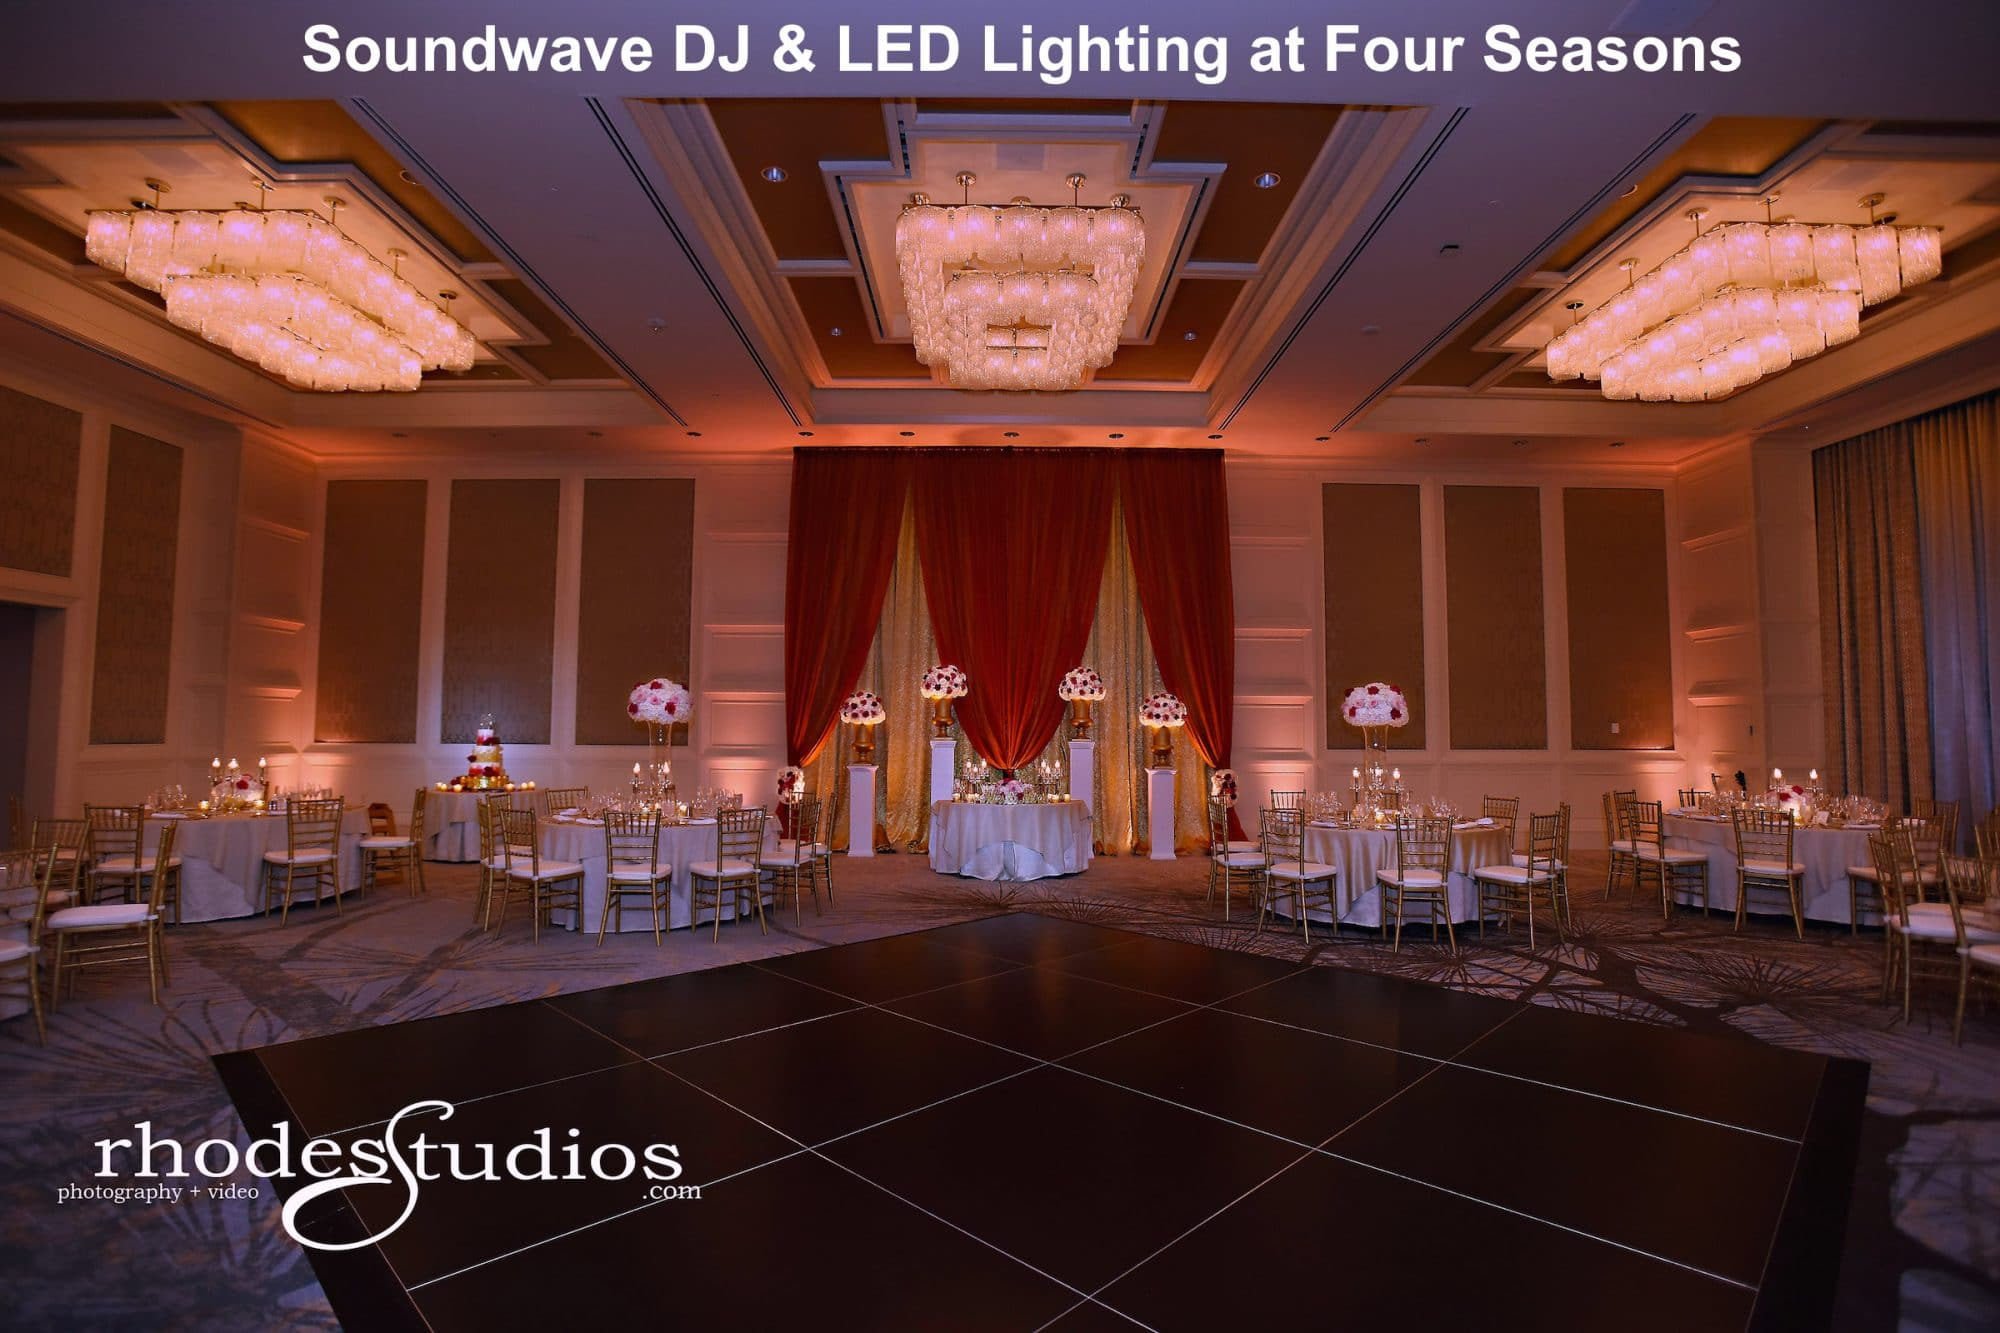 elegant uplighting at the Four Seasons